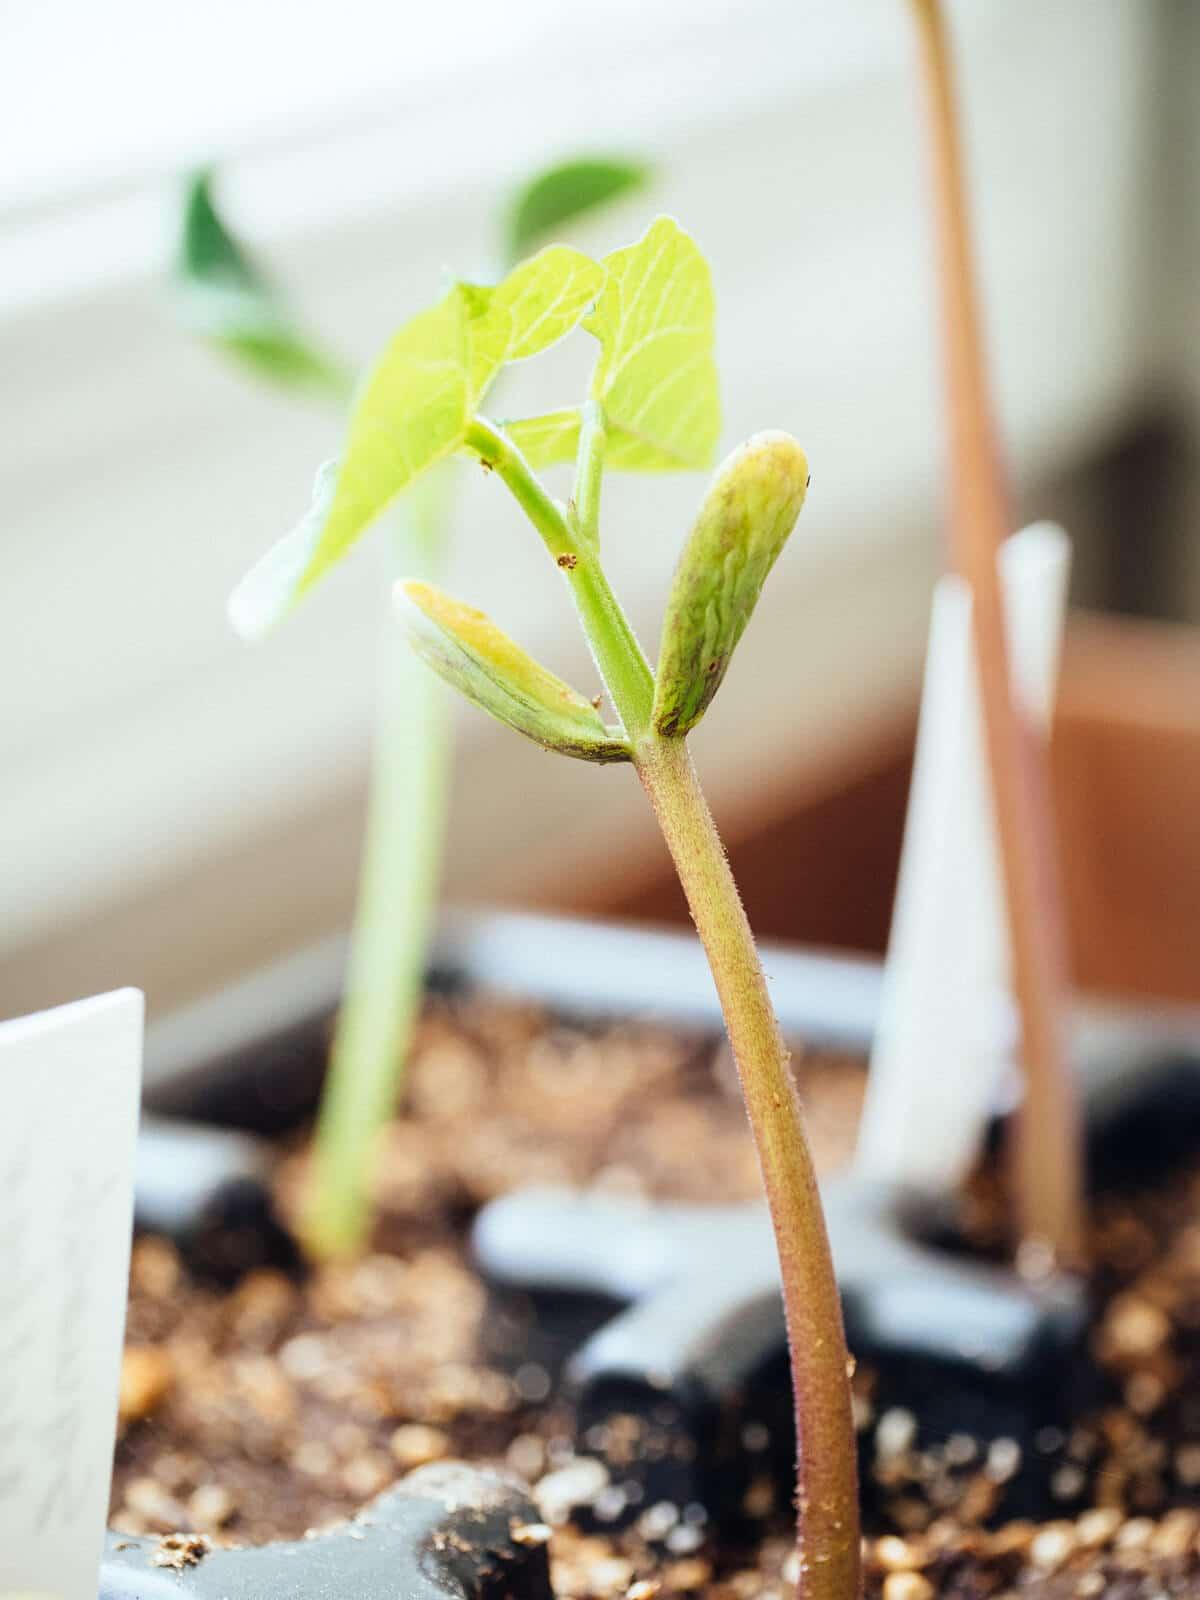 Bean seedling with great vigor